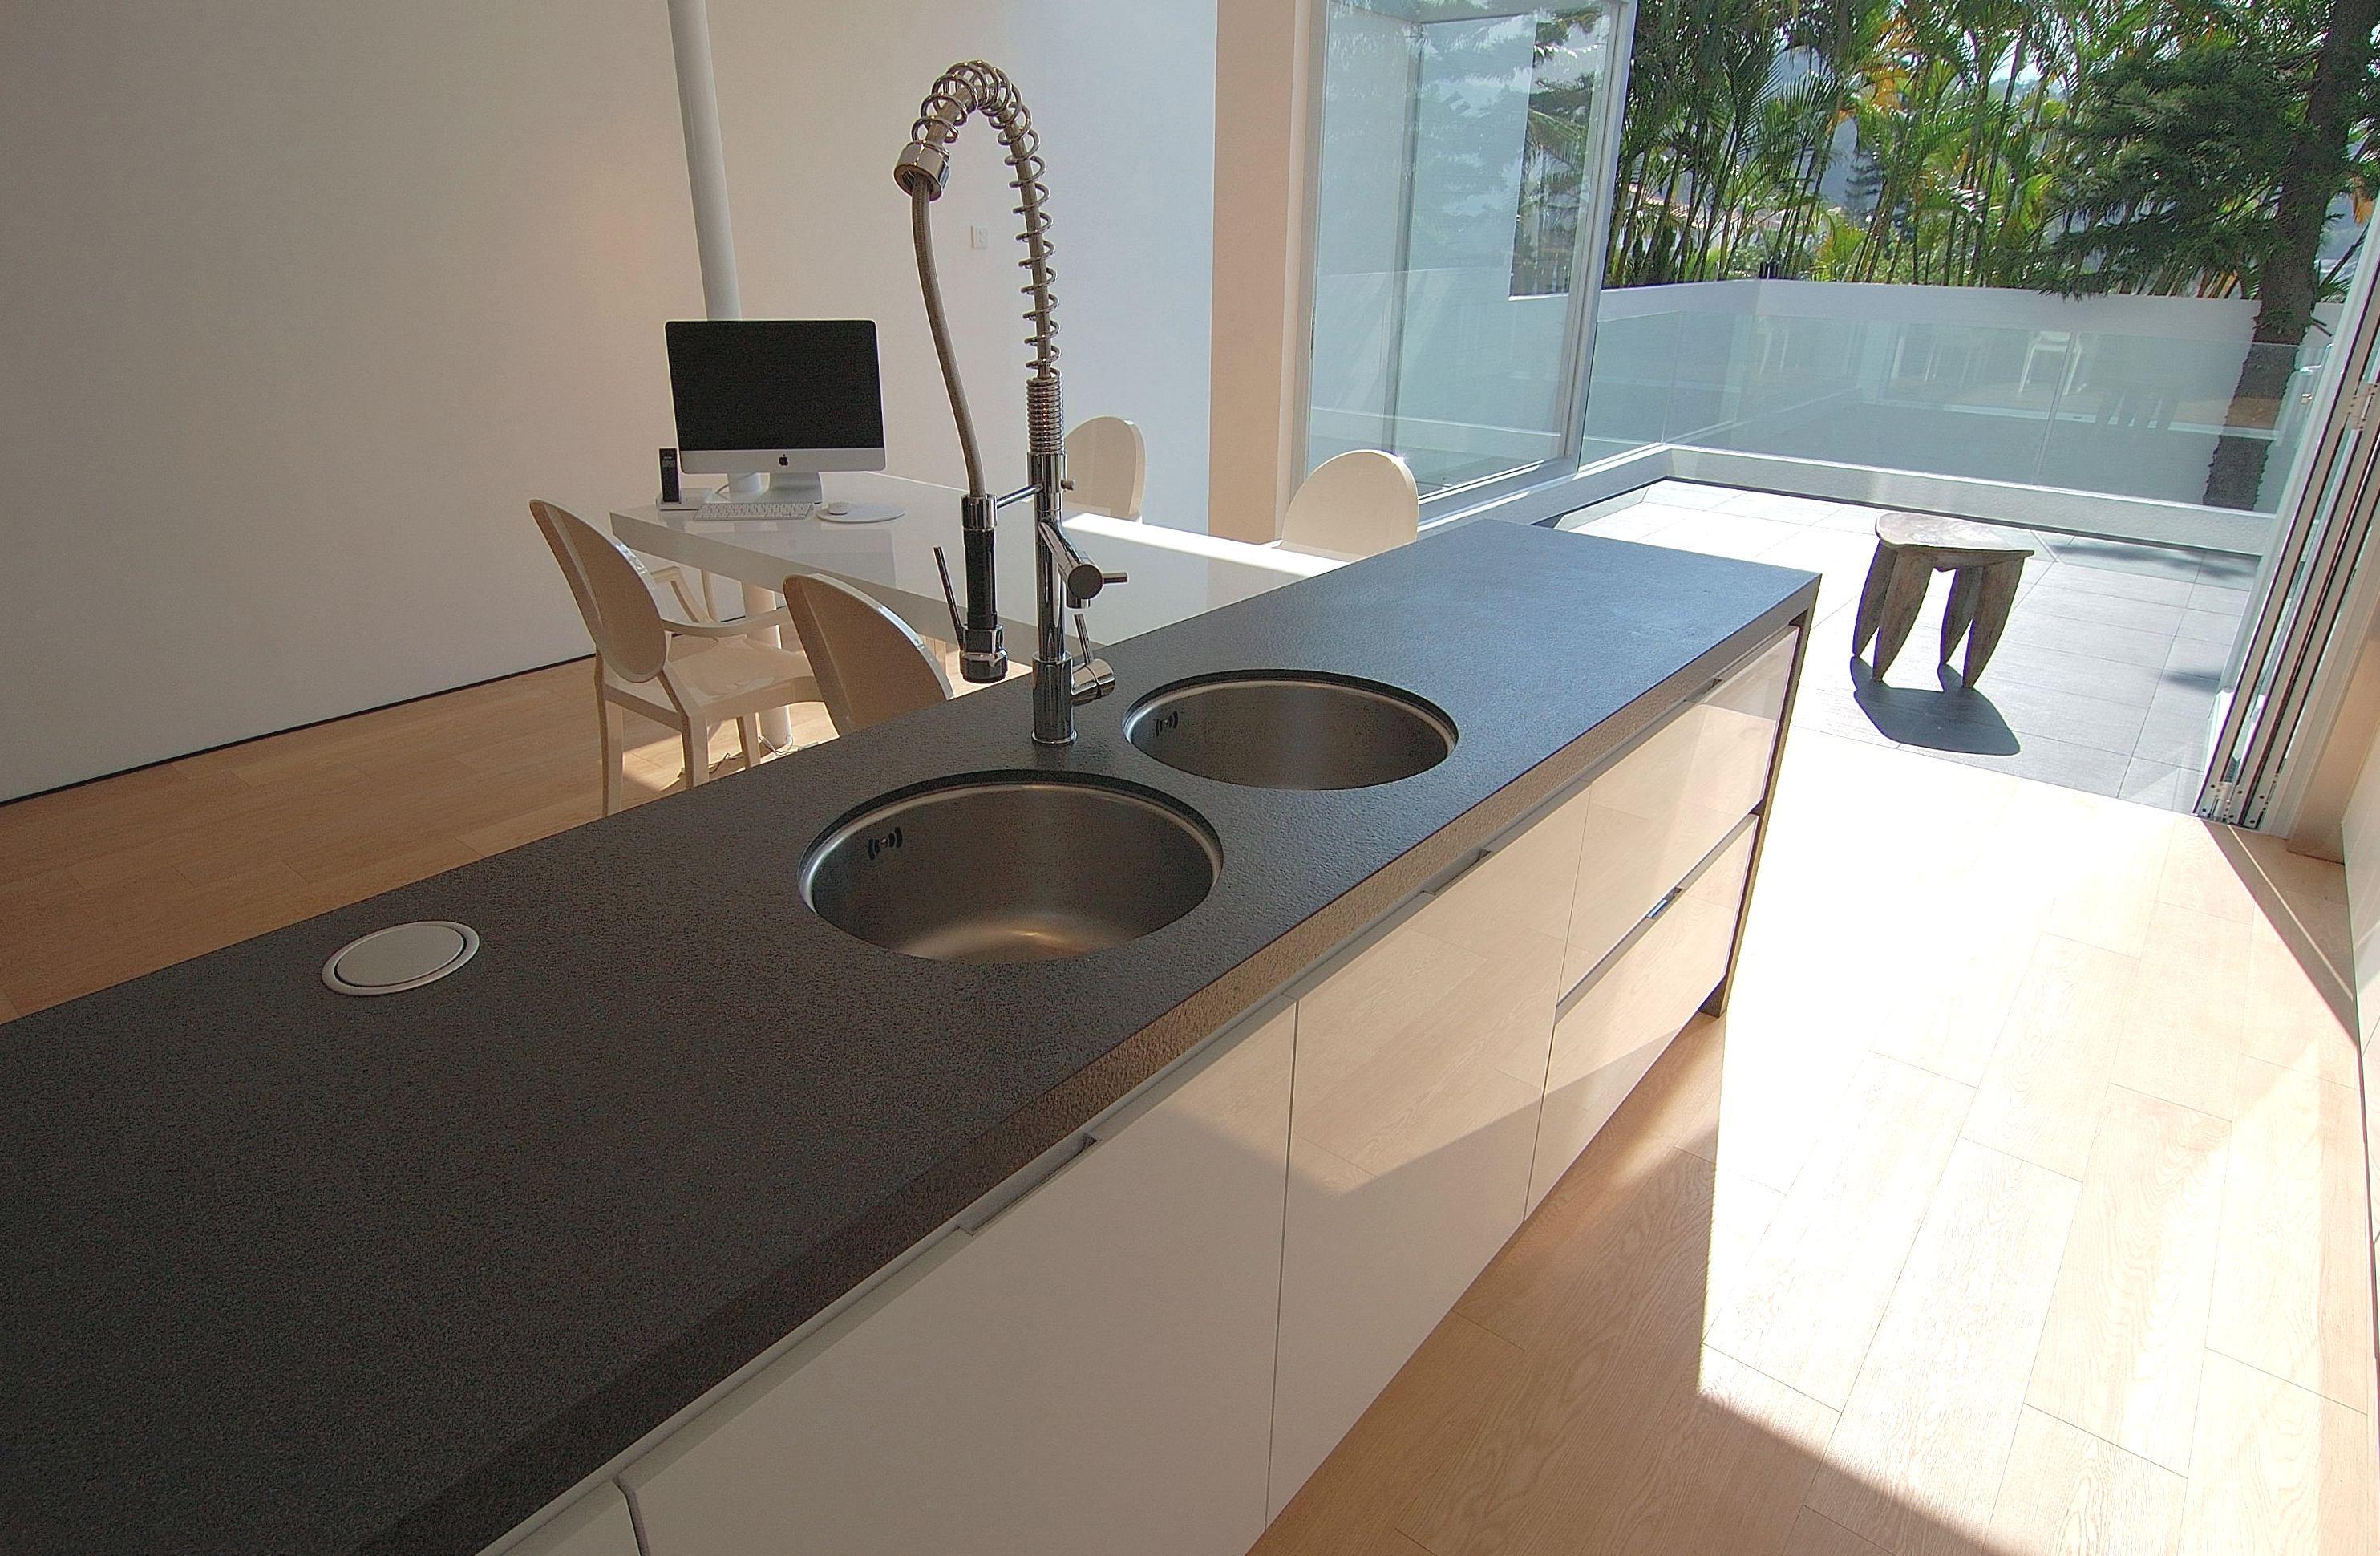 Technistone #Gobi Grey #sink | Kitchen sink could be a piece of art ...